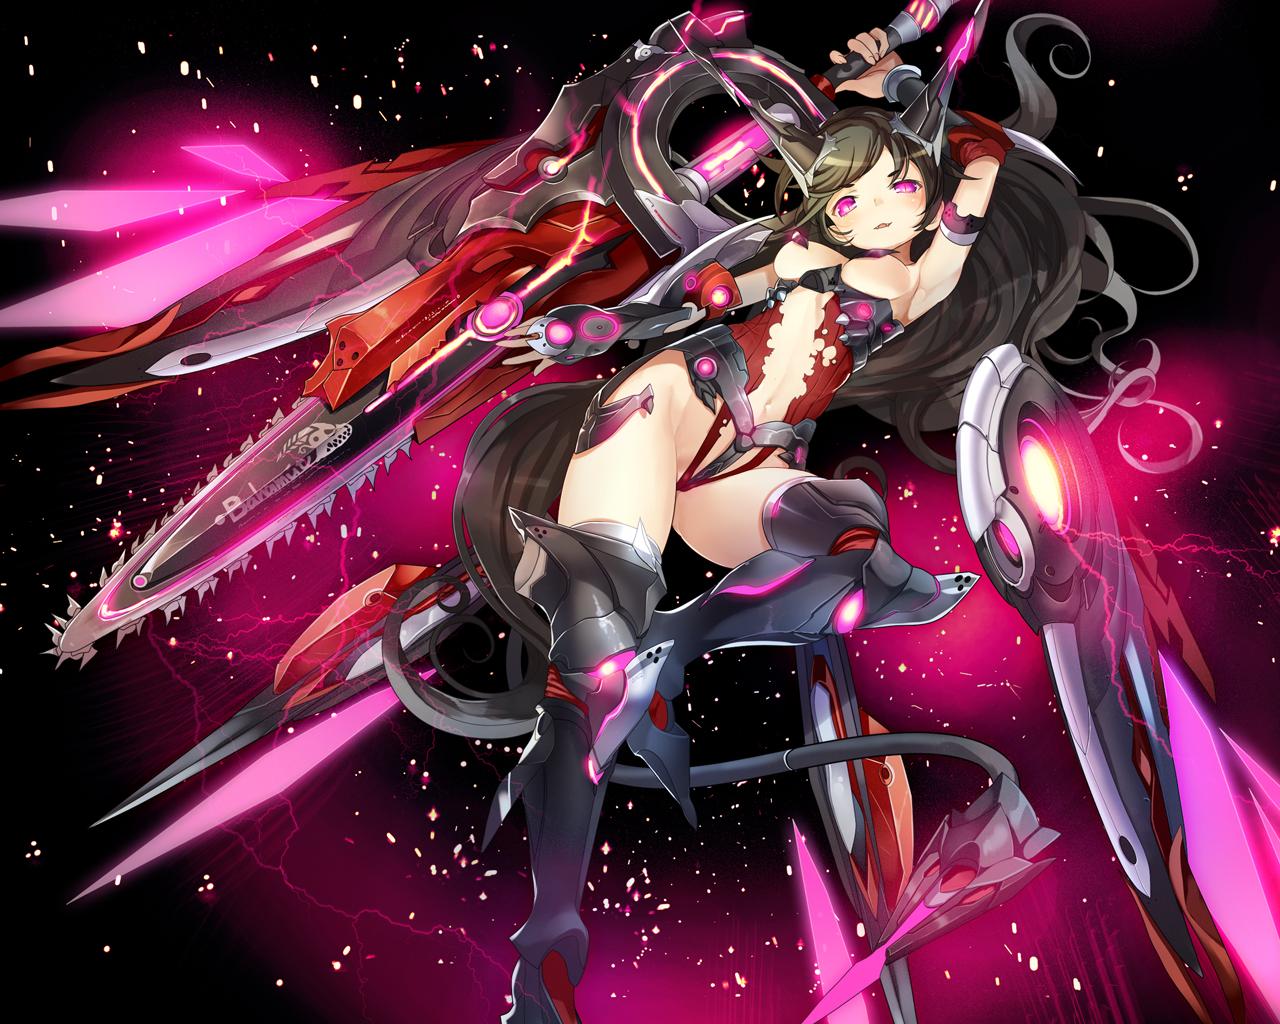 black_hair bodysuit chainsaw leotard long_hair mechagirl navel original purple_eyes sword weapon yam2344